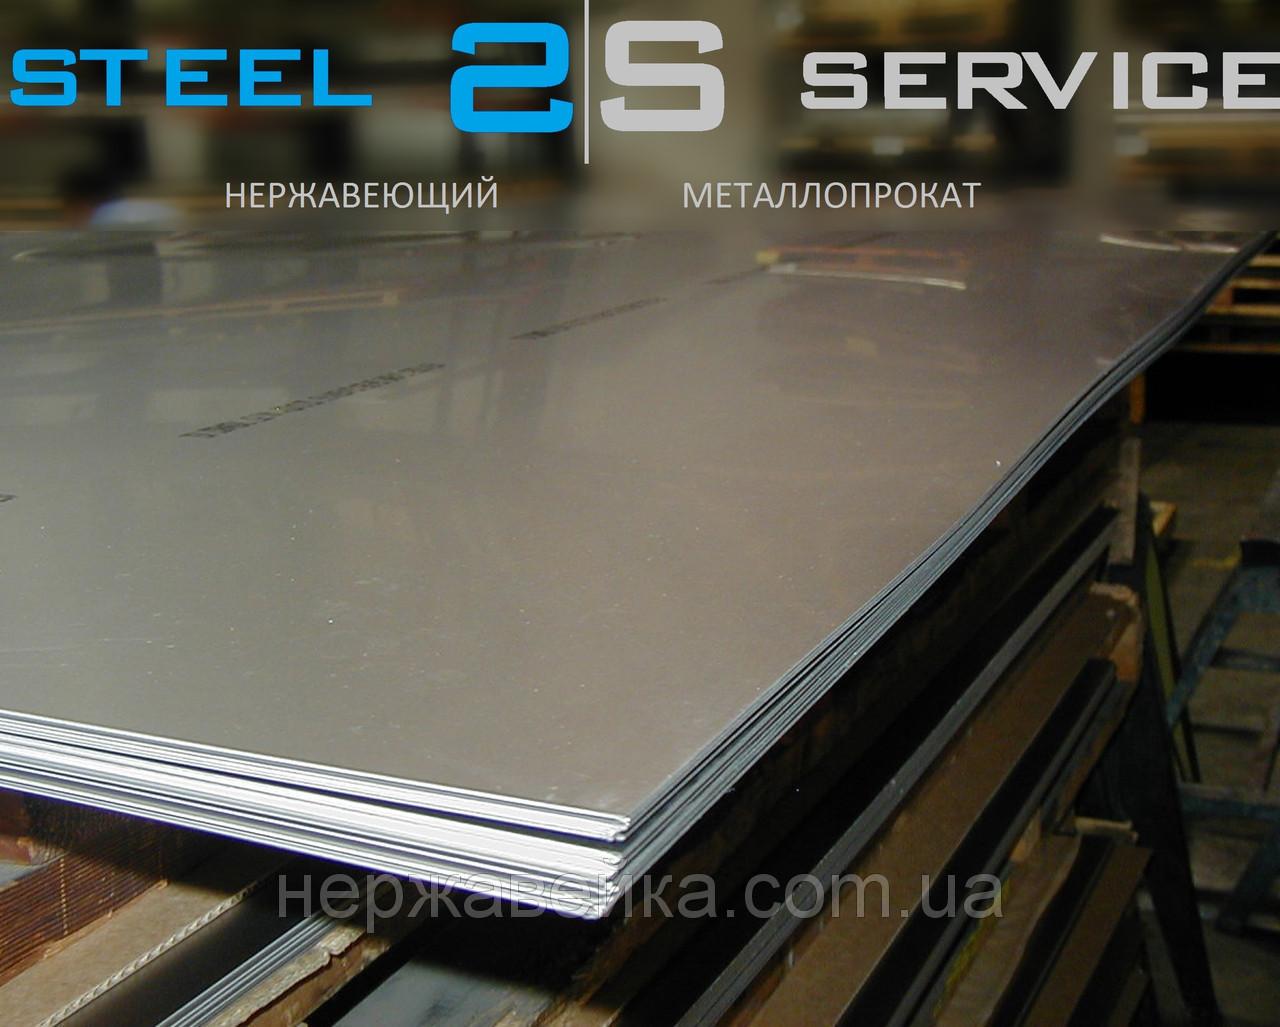 Нержавеющий лист 3х1500х3000мм  AISI 316L(03Х17Н14М3) 2B - матовый,  кислотостойкий